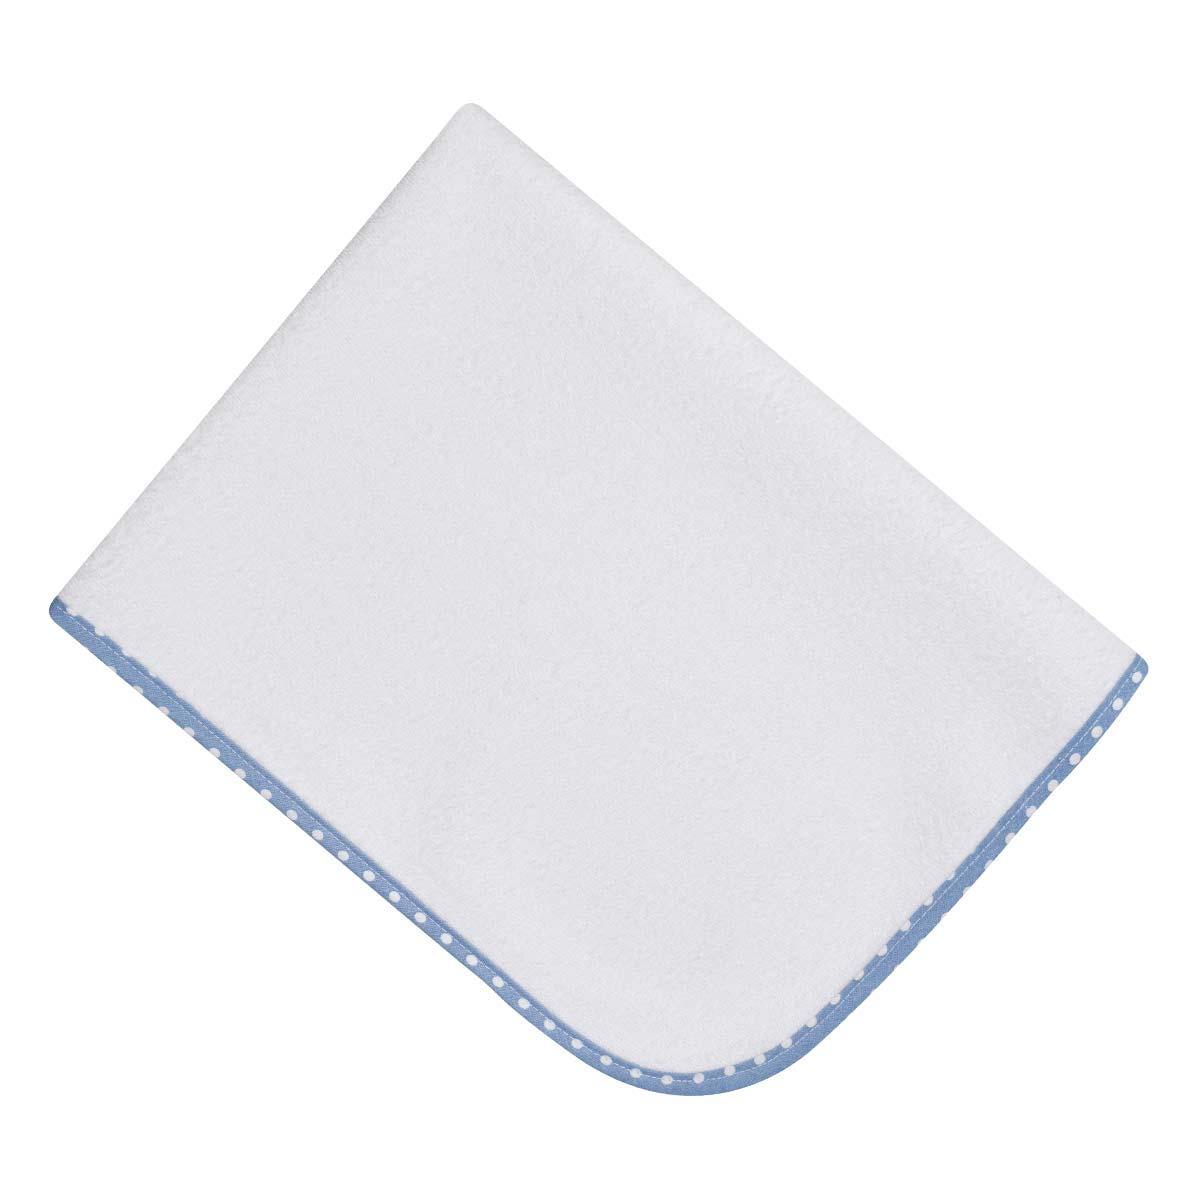 Bunny bebe σελτεδάκι 45×65 με ρέλι μπλε πουά